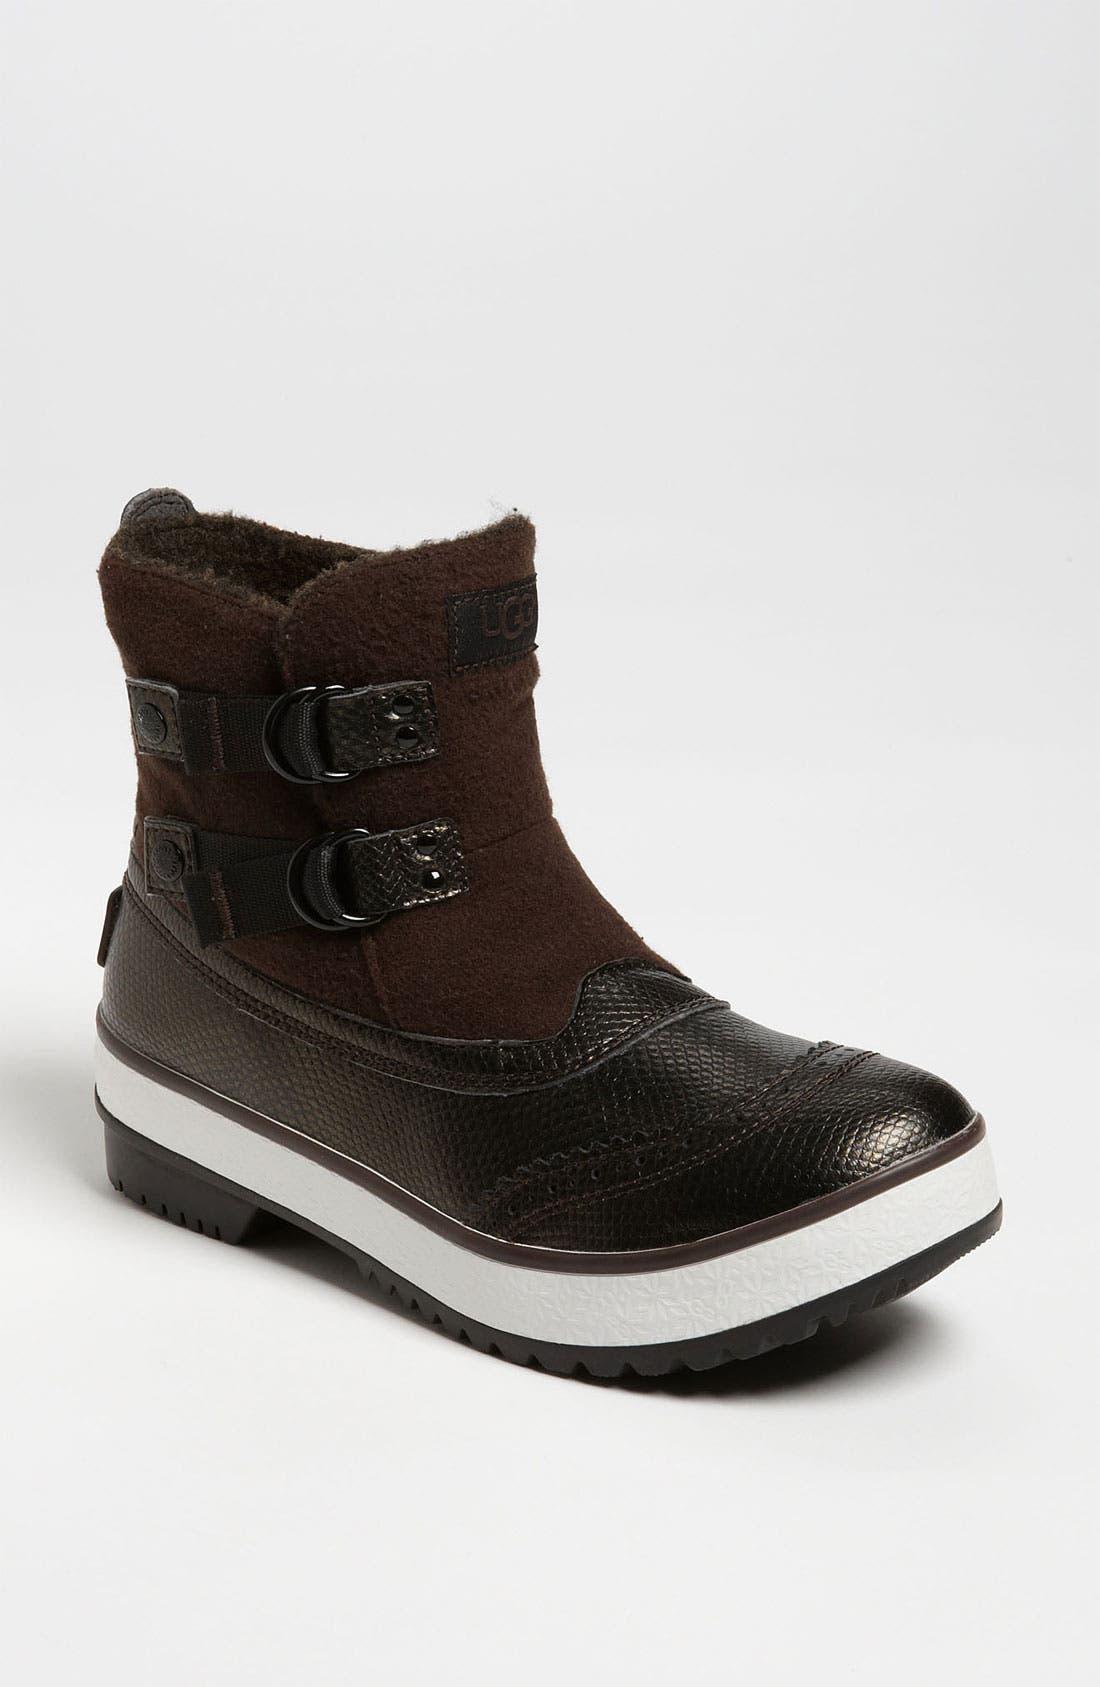 Main Image - UGG® Australia 'Marrais' Boot (Women)